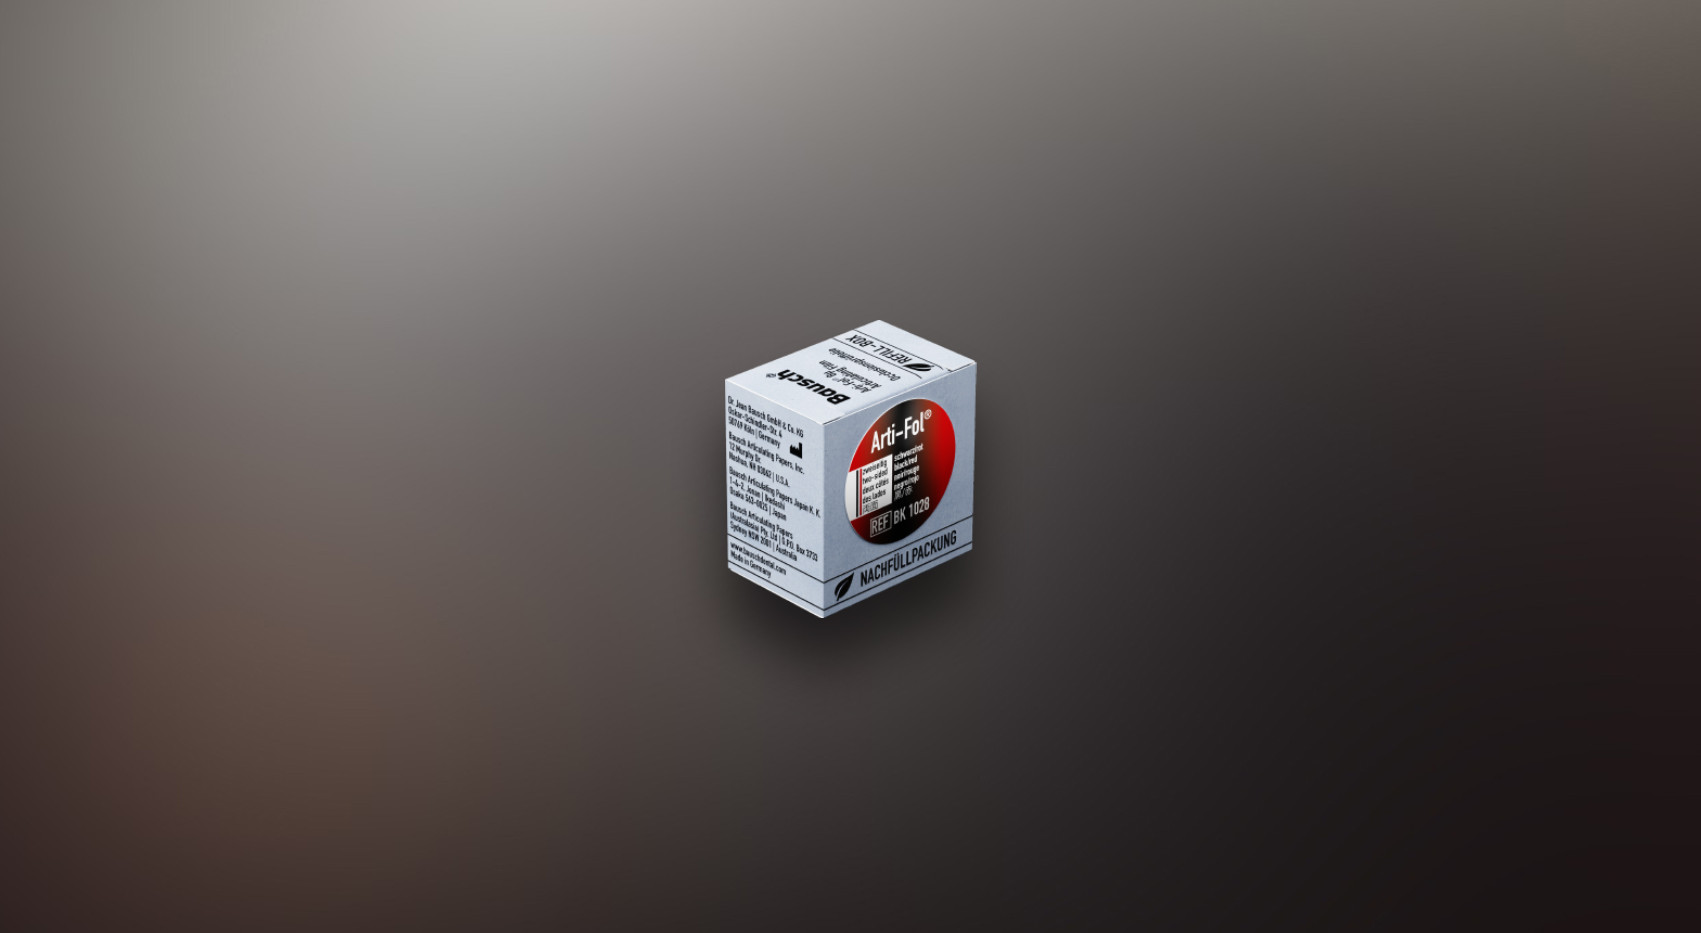 Arti-Fol metallic 12µ